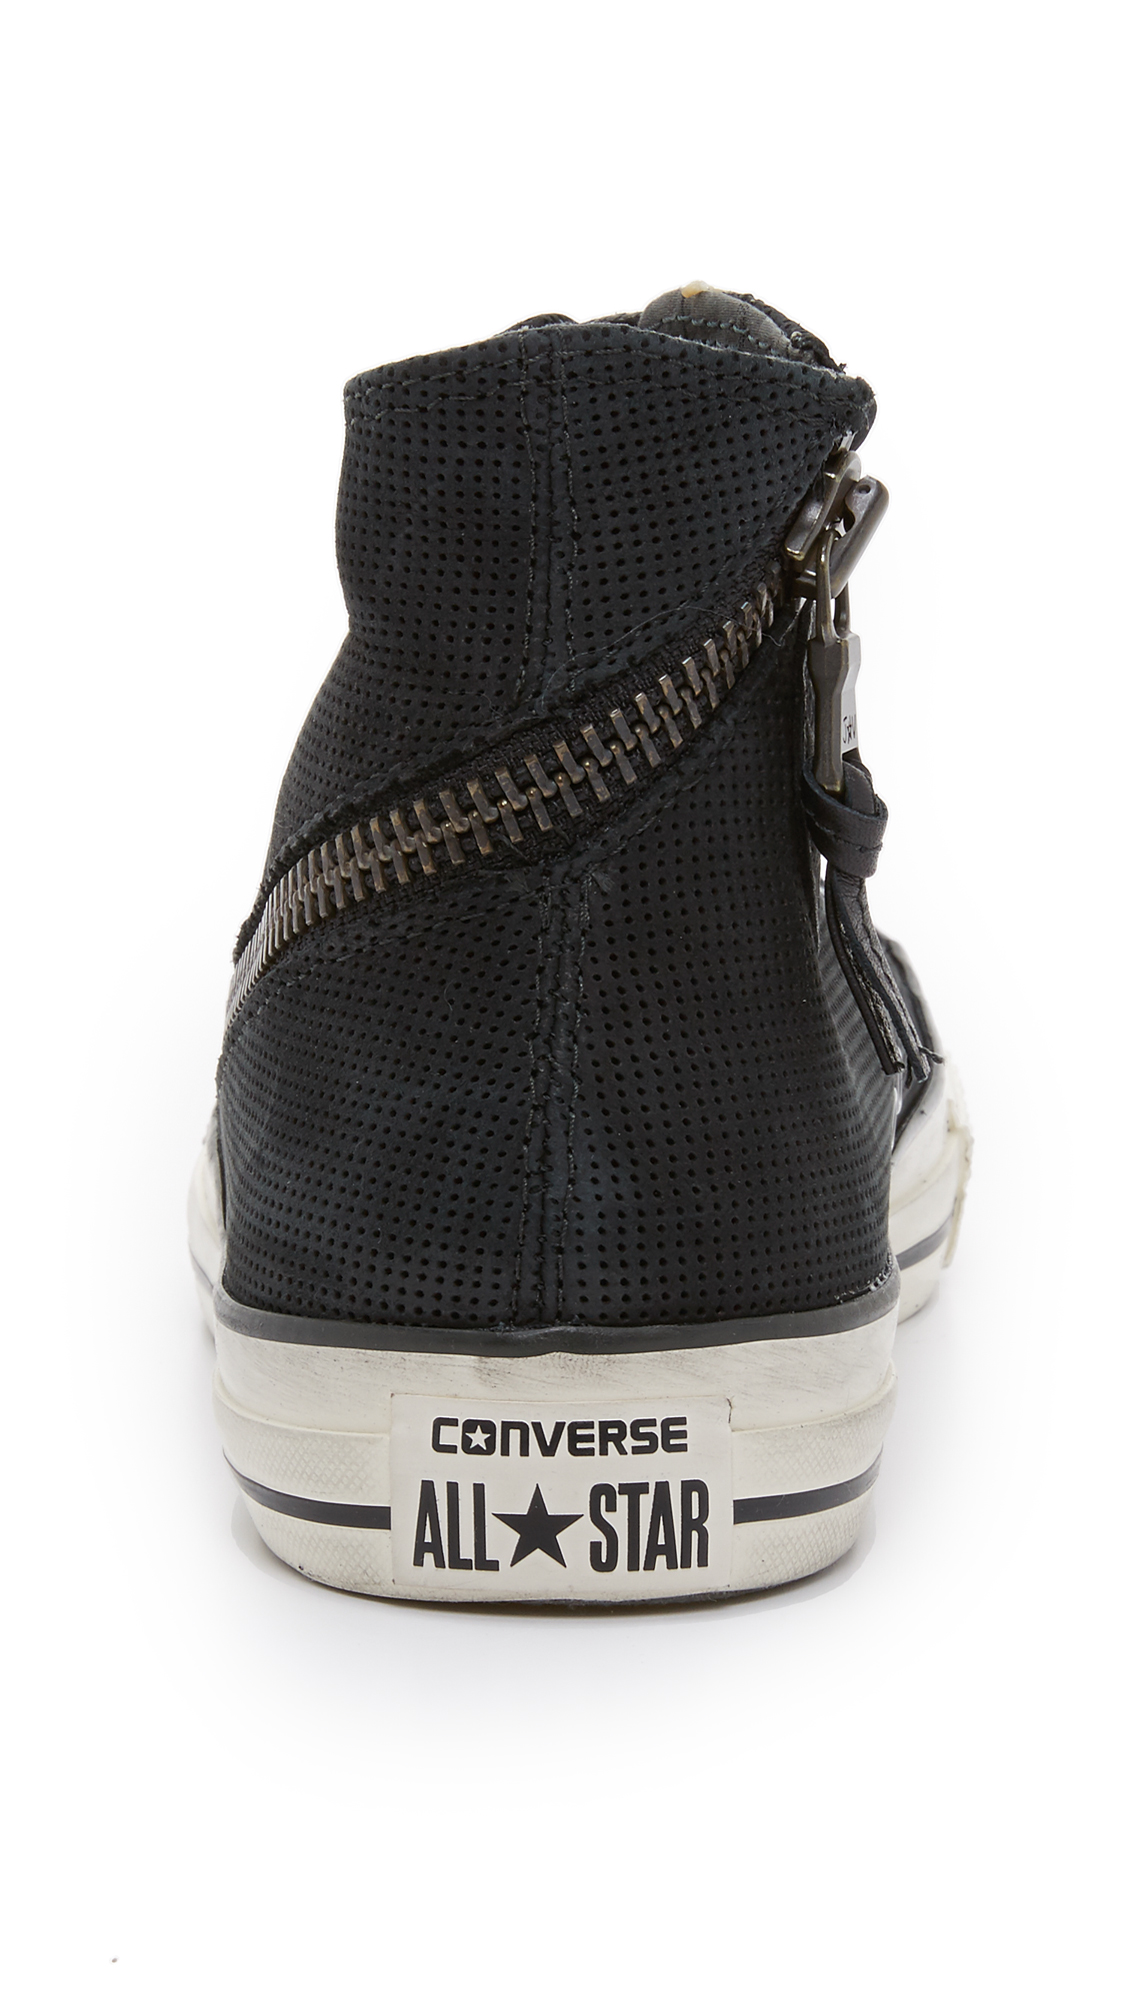 2c6986847d73 Converse x John Varvatos Chuck Taylor All Star Tornado Zip High Top  Sneakers